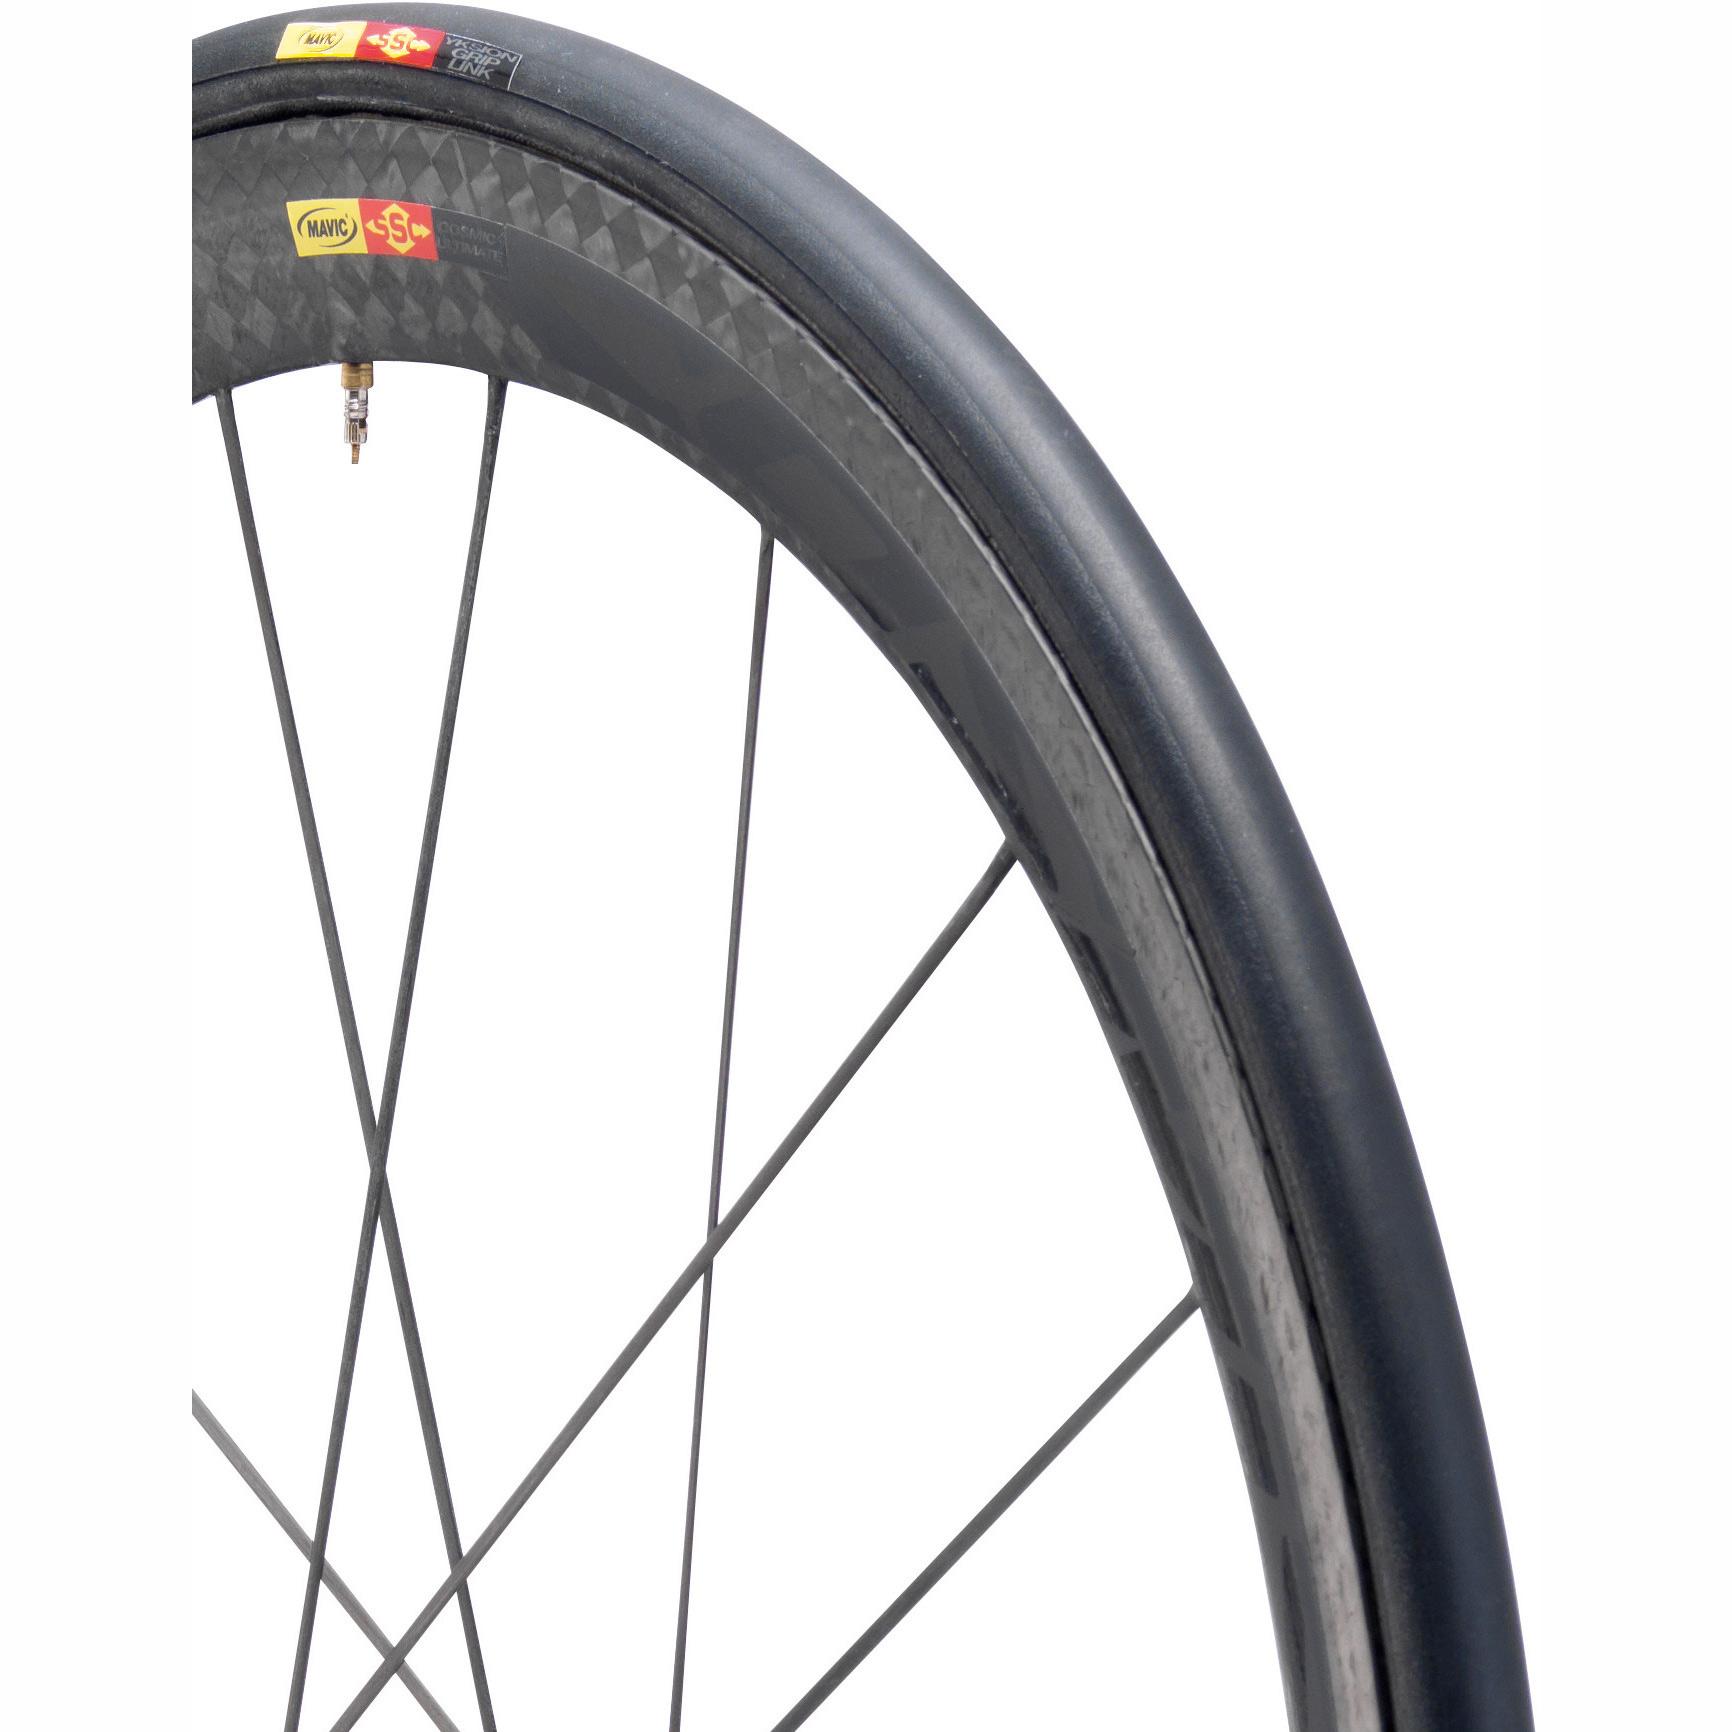 Mavic Yksion Griplink Tubular Bicycle Post Greenville